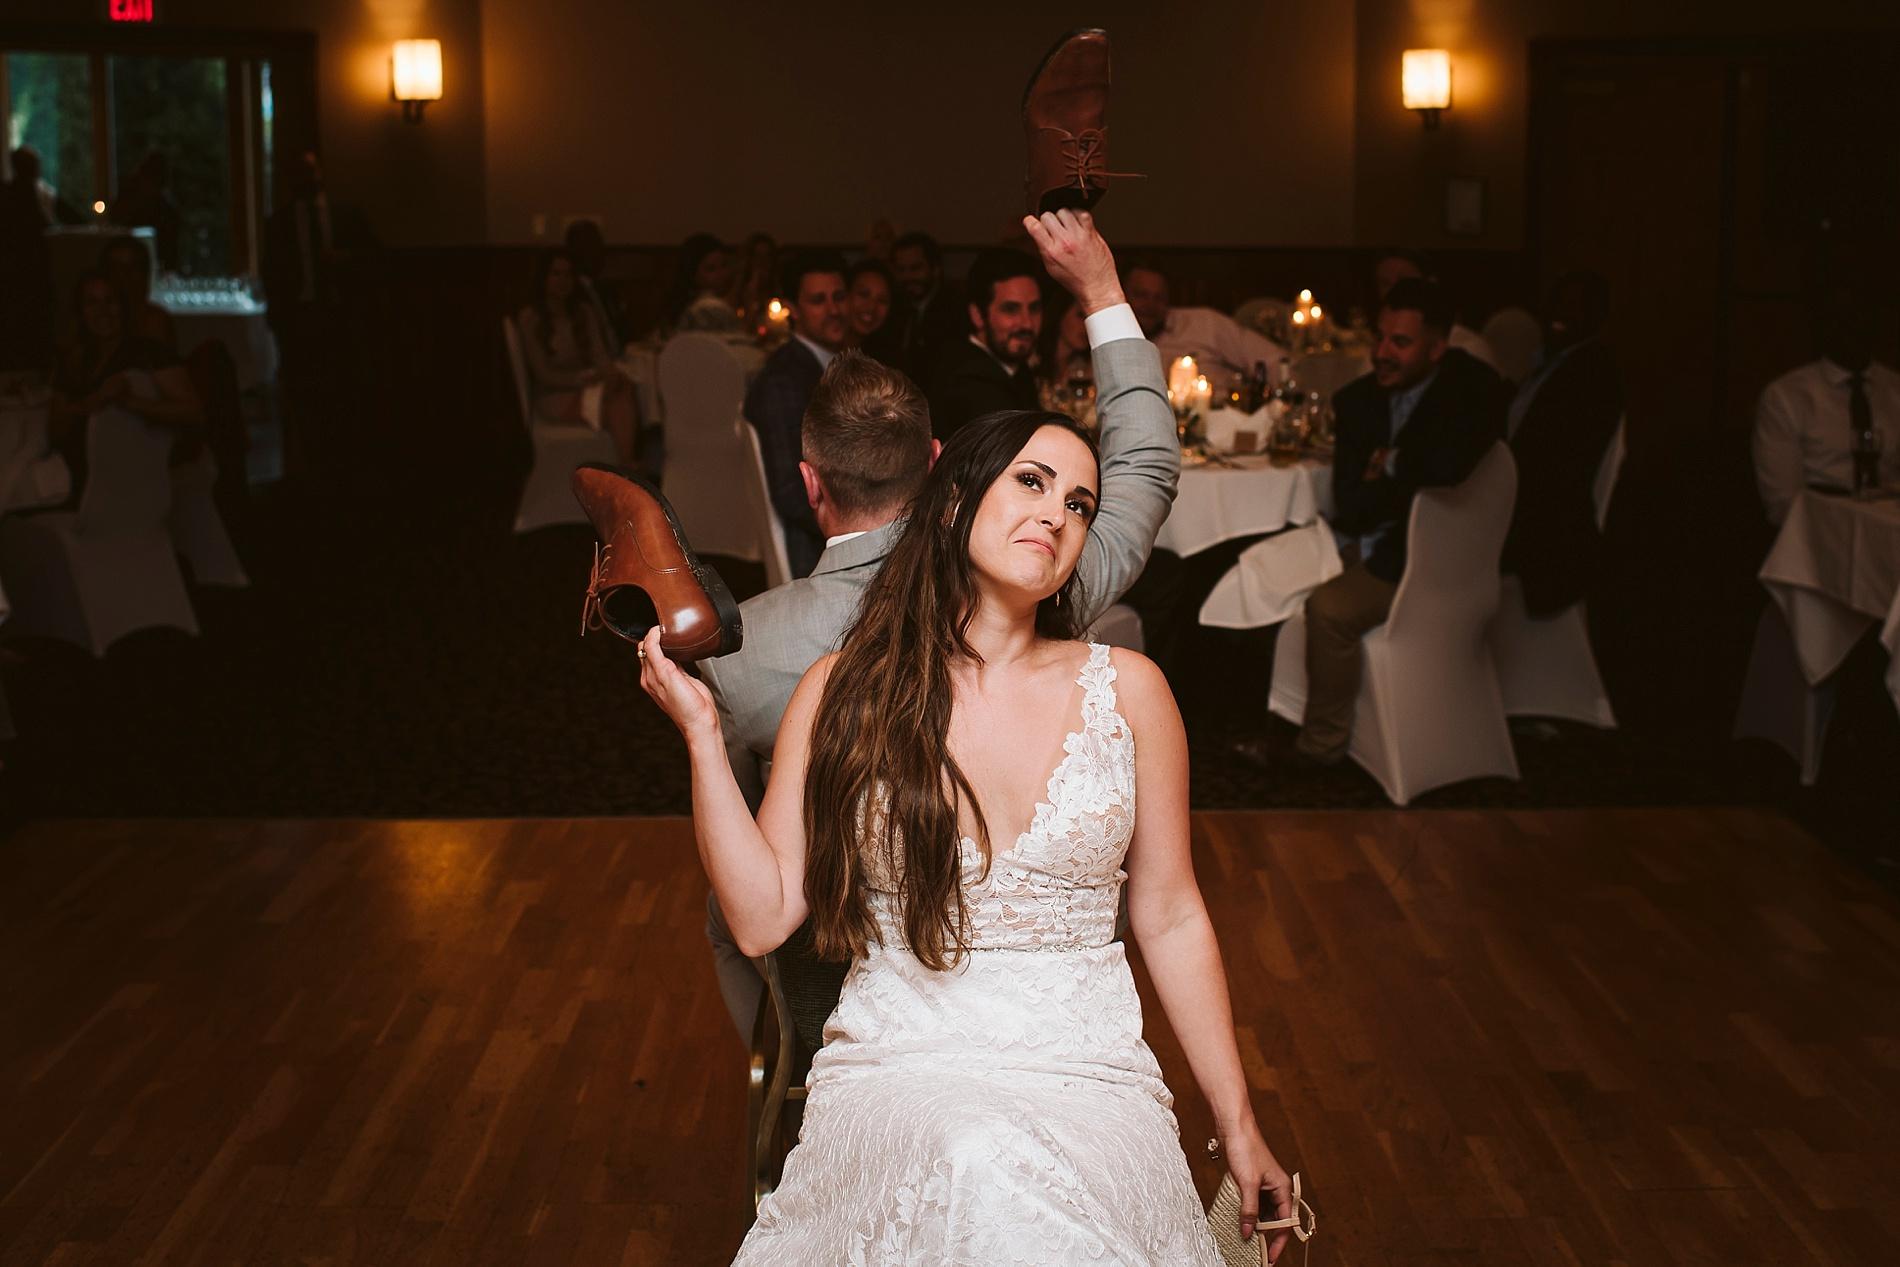 Kawartha_Lakes_Wedding_Bobcageon_Eganridge_Resort_Toronto_Photographer_0074.jpg